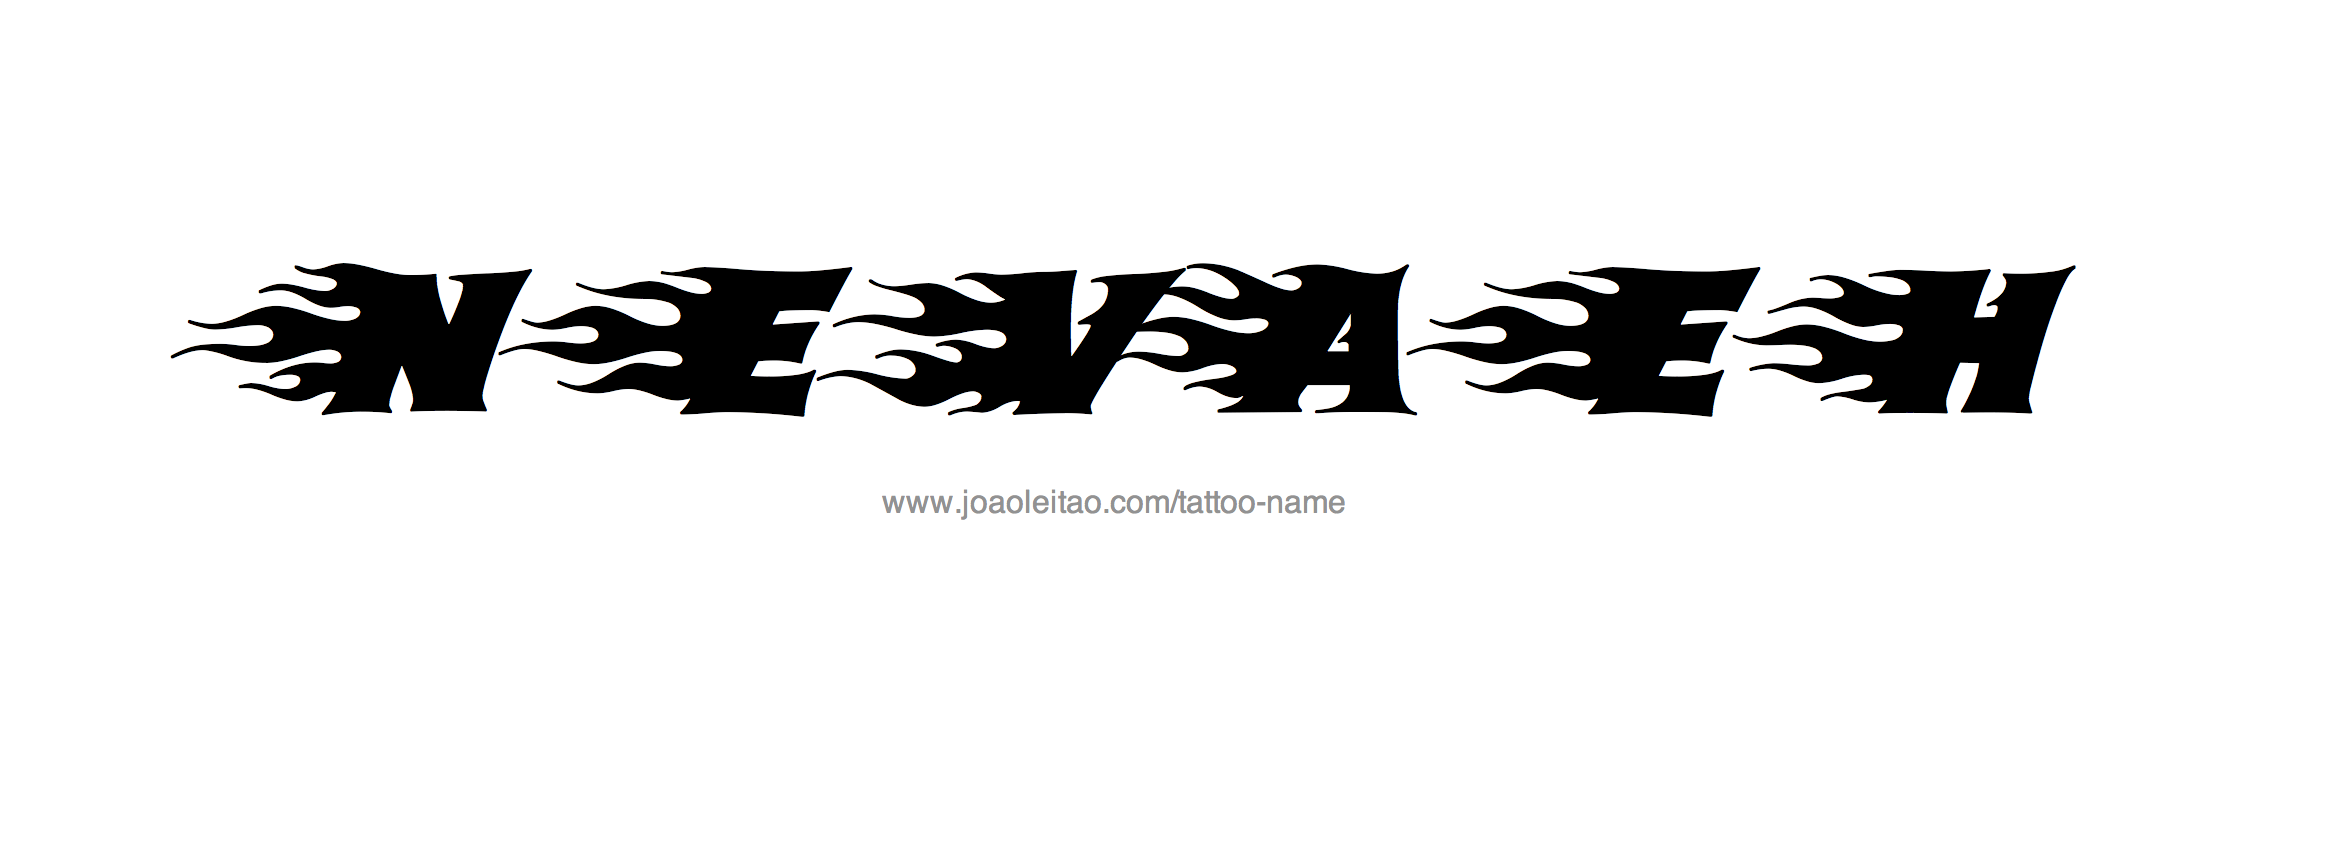 tattoo-design-female-name-nevaeh%20(23).png